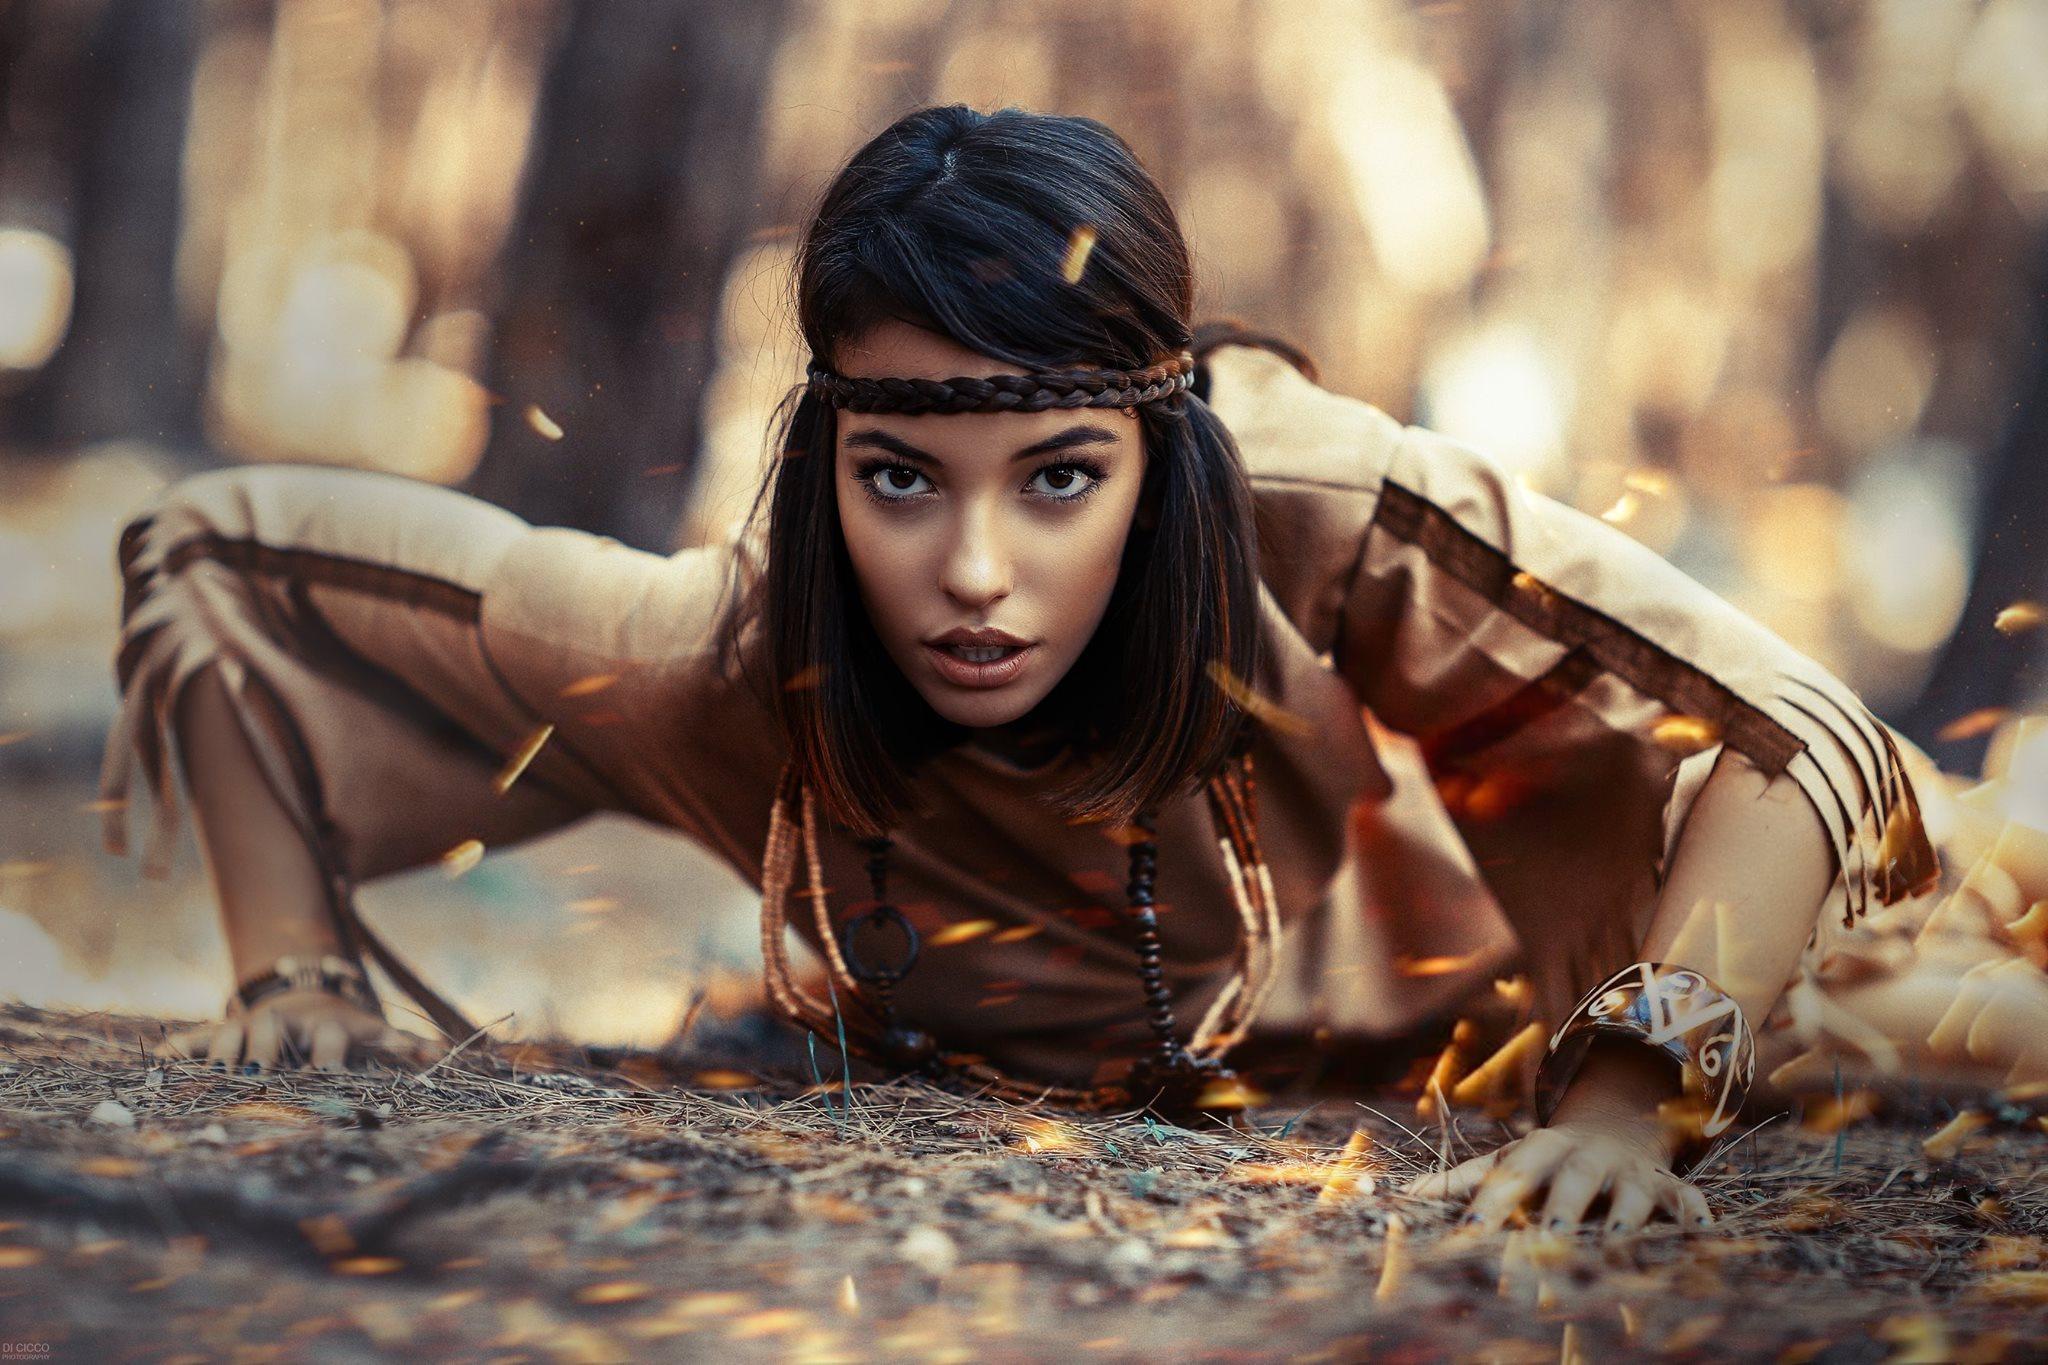 Brown Eyes Brunette Depth Of Field Girl Model Native American Woman 2048x1365